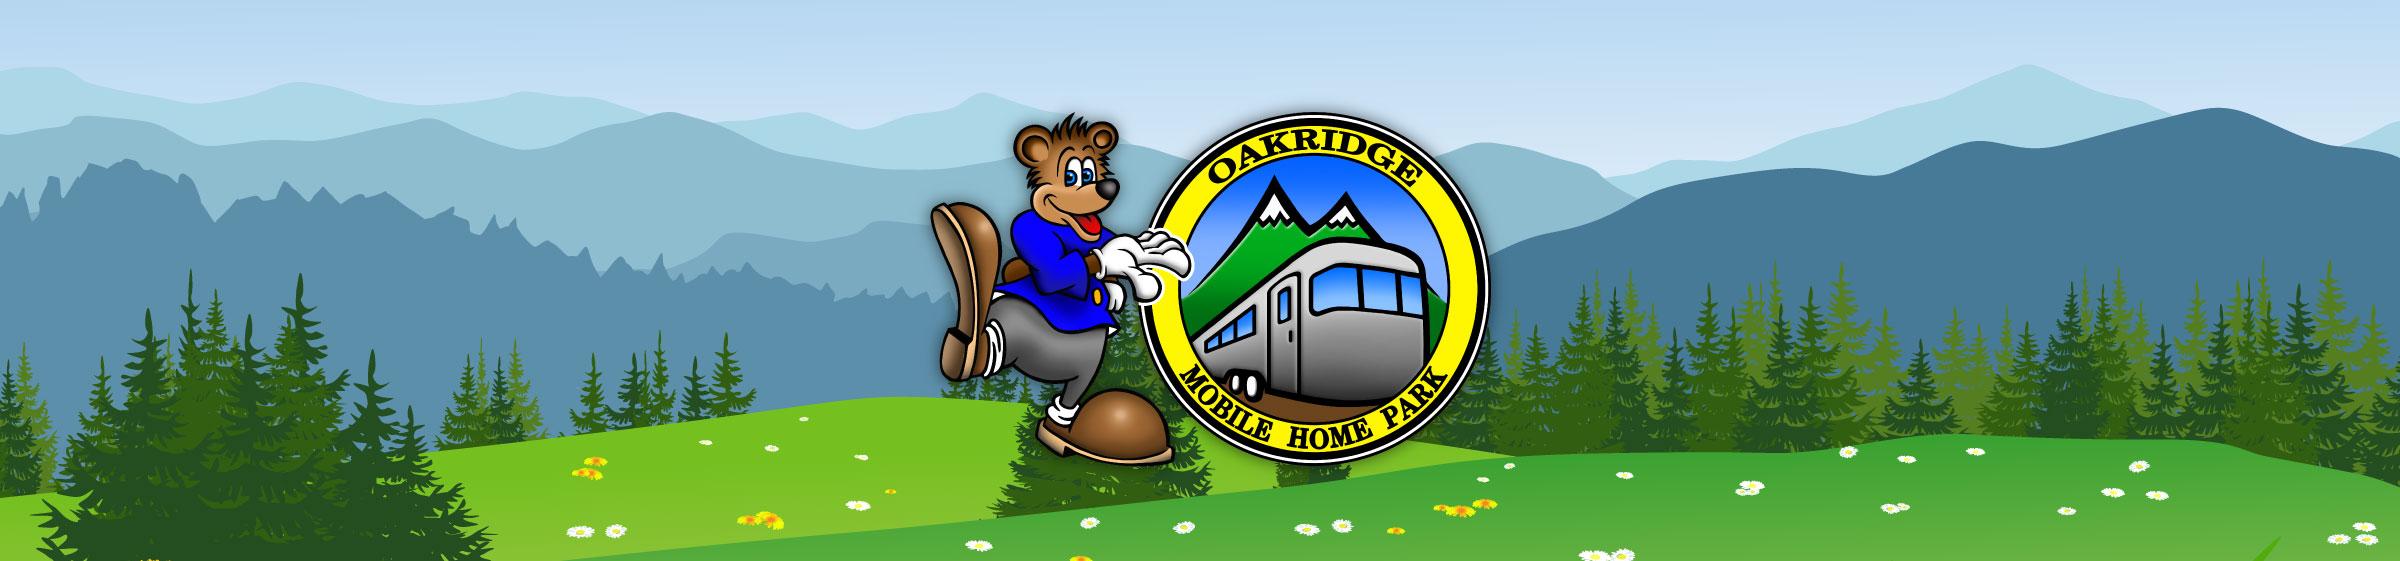 Oakridge homepage image